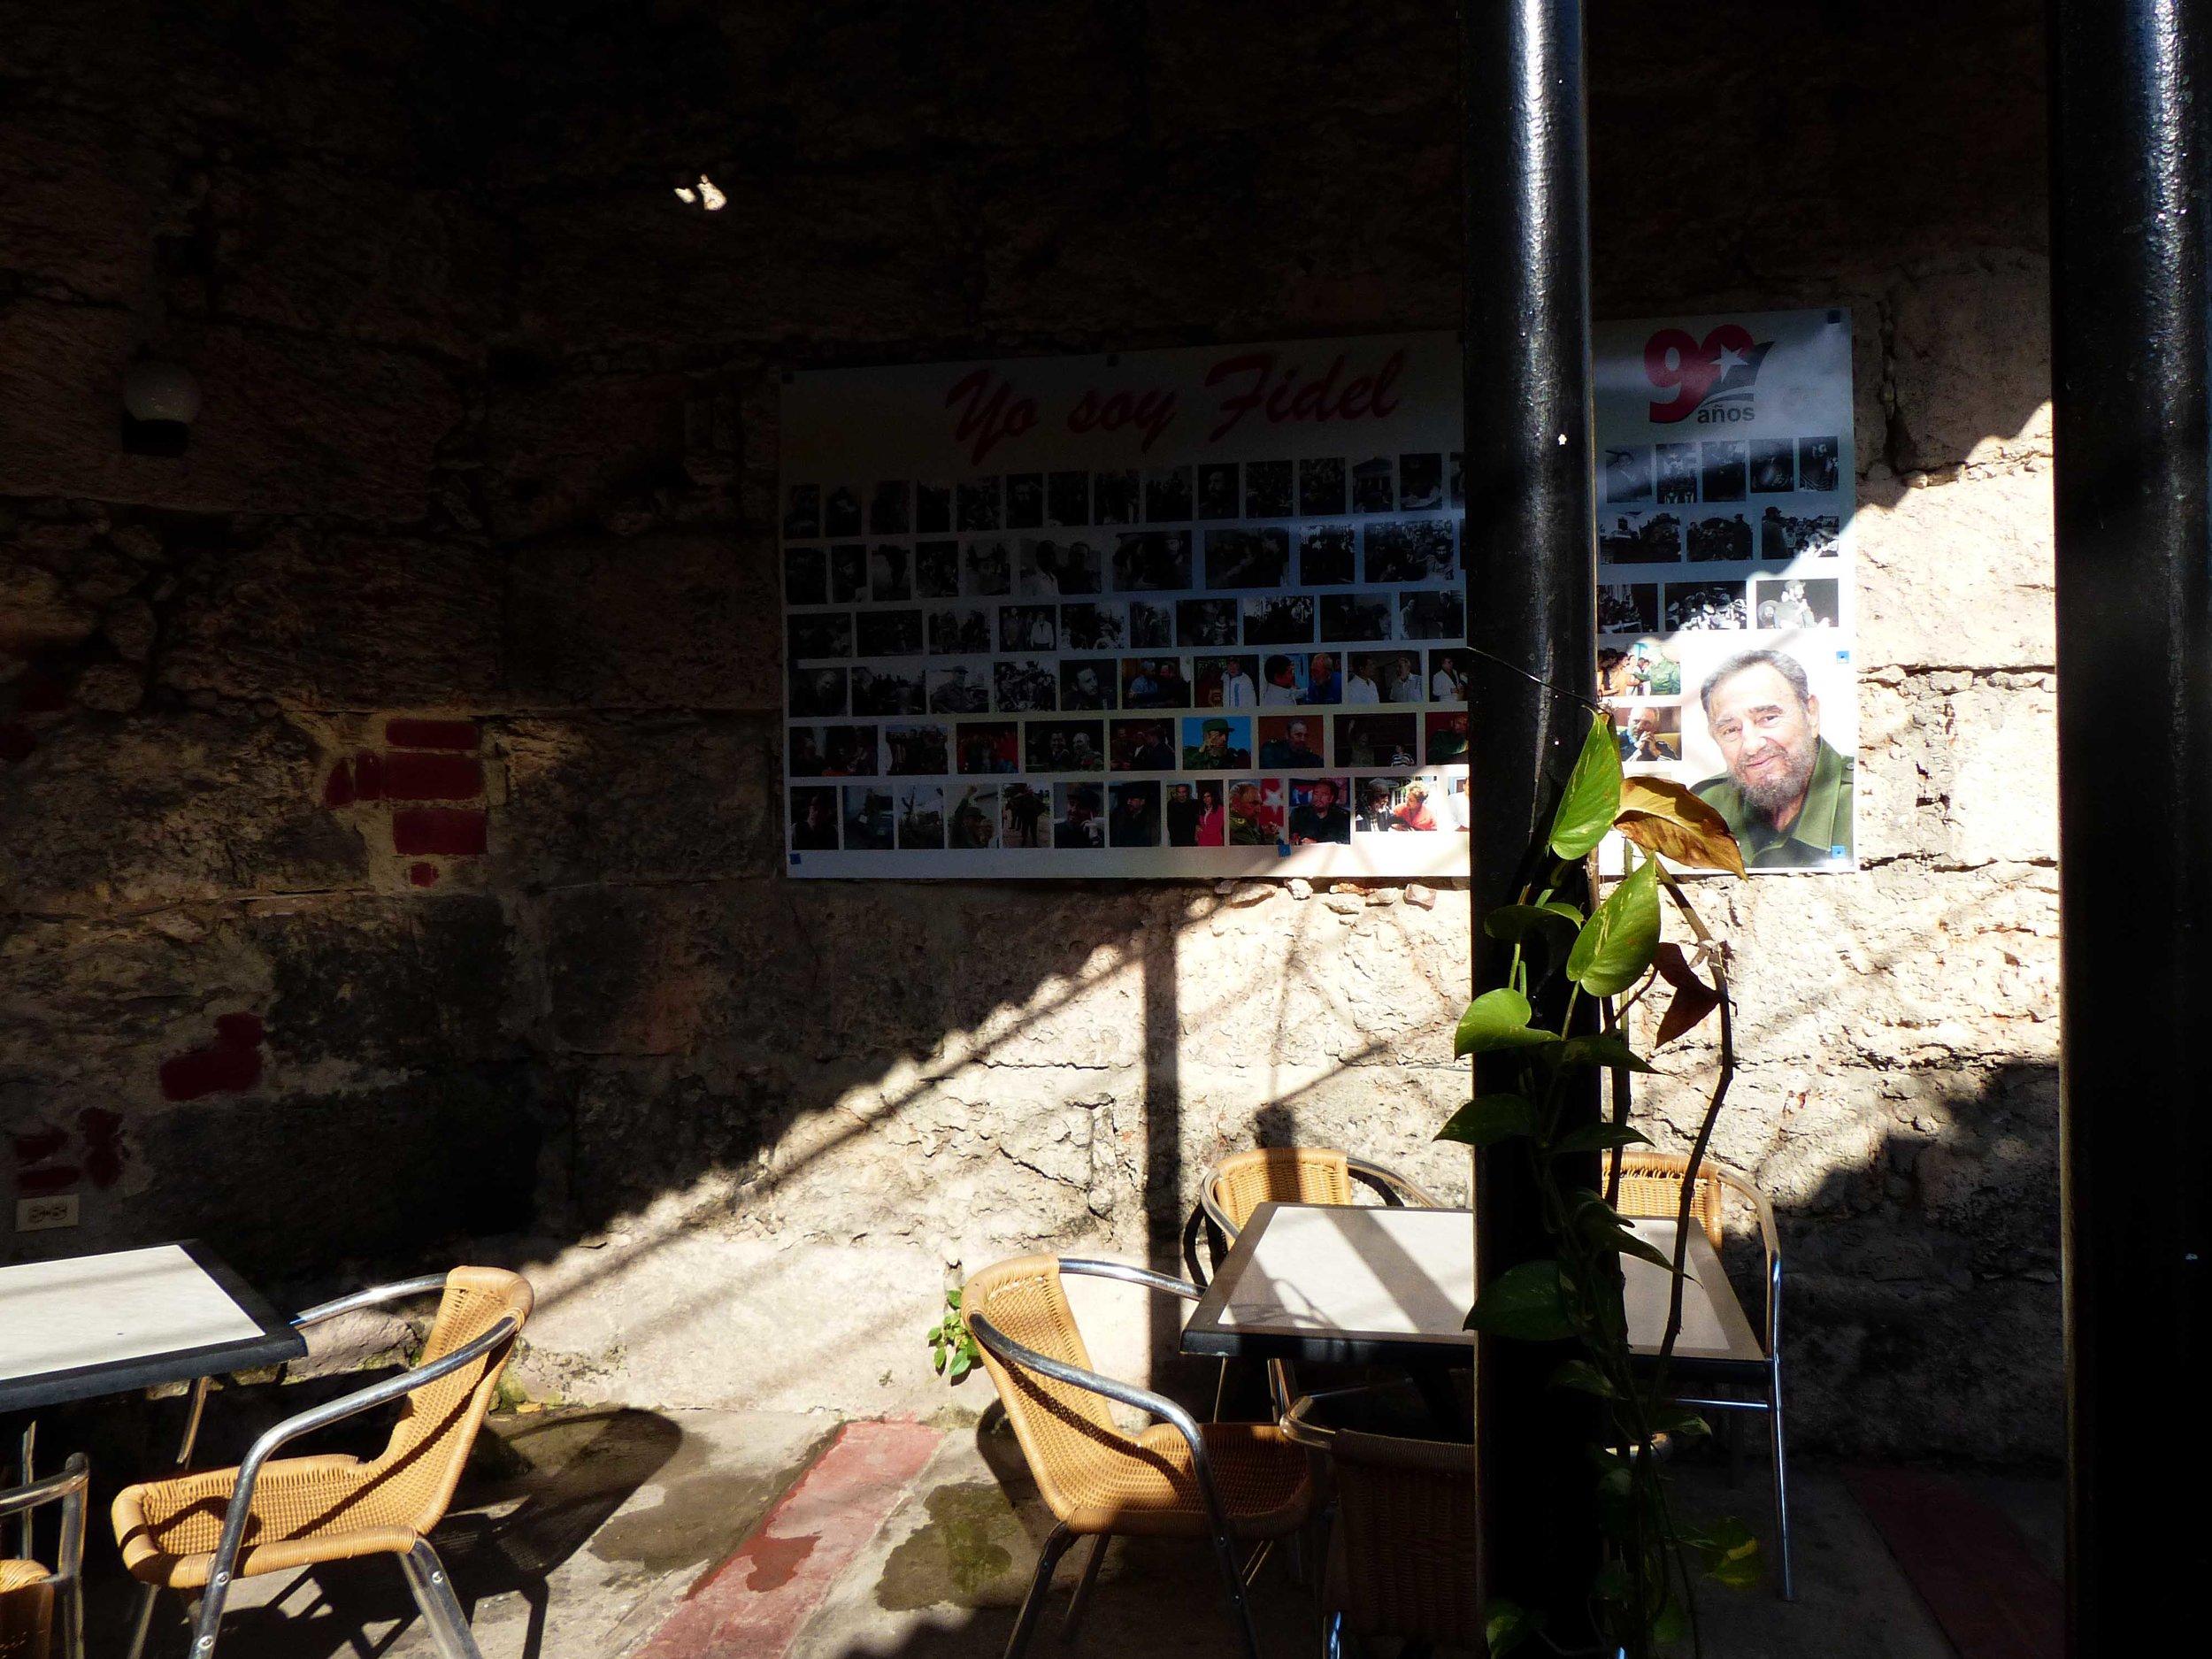 cafecastro.jpg